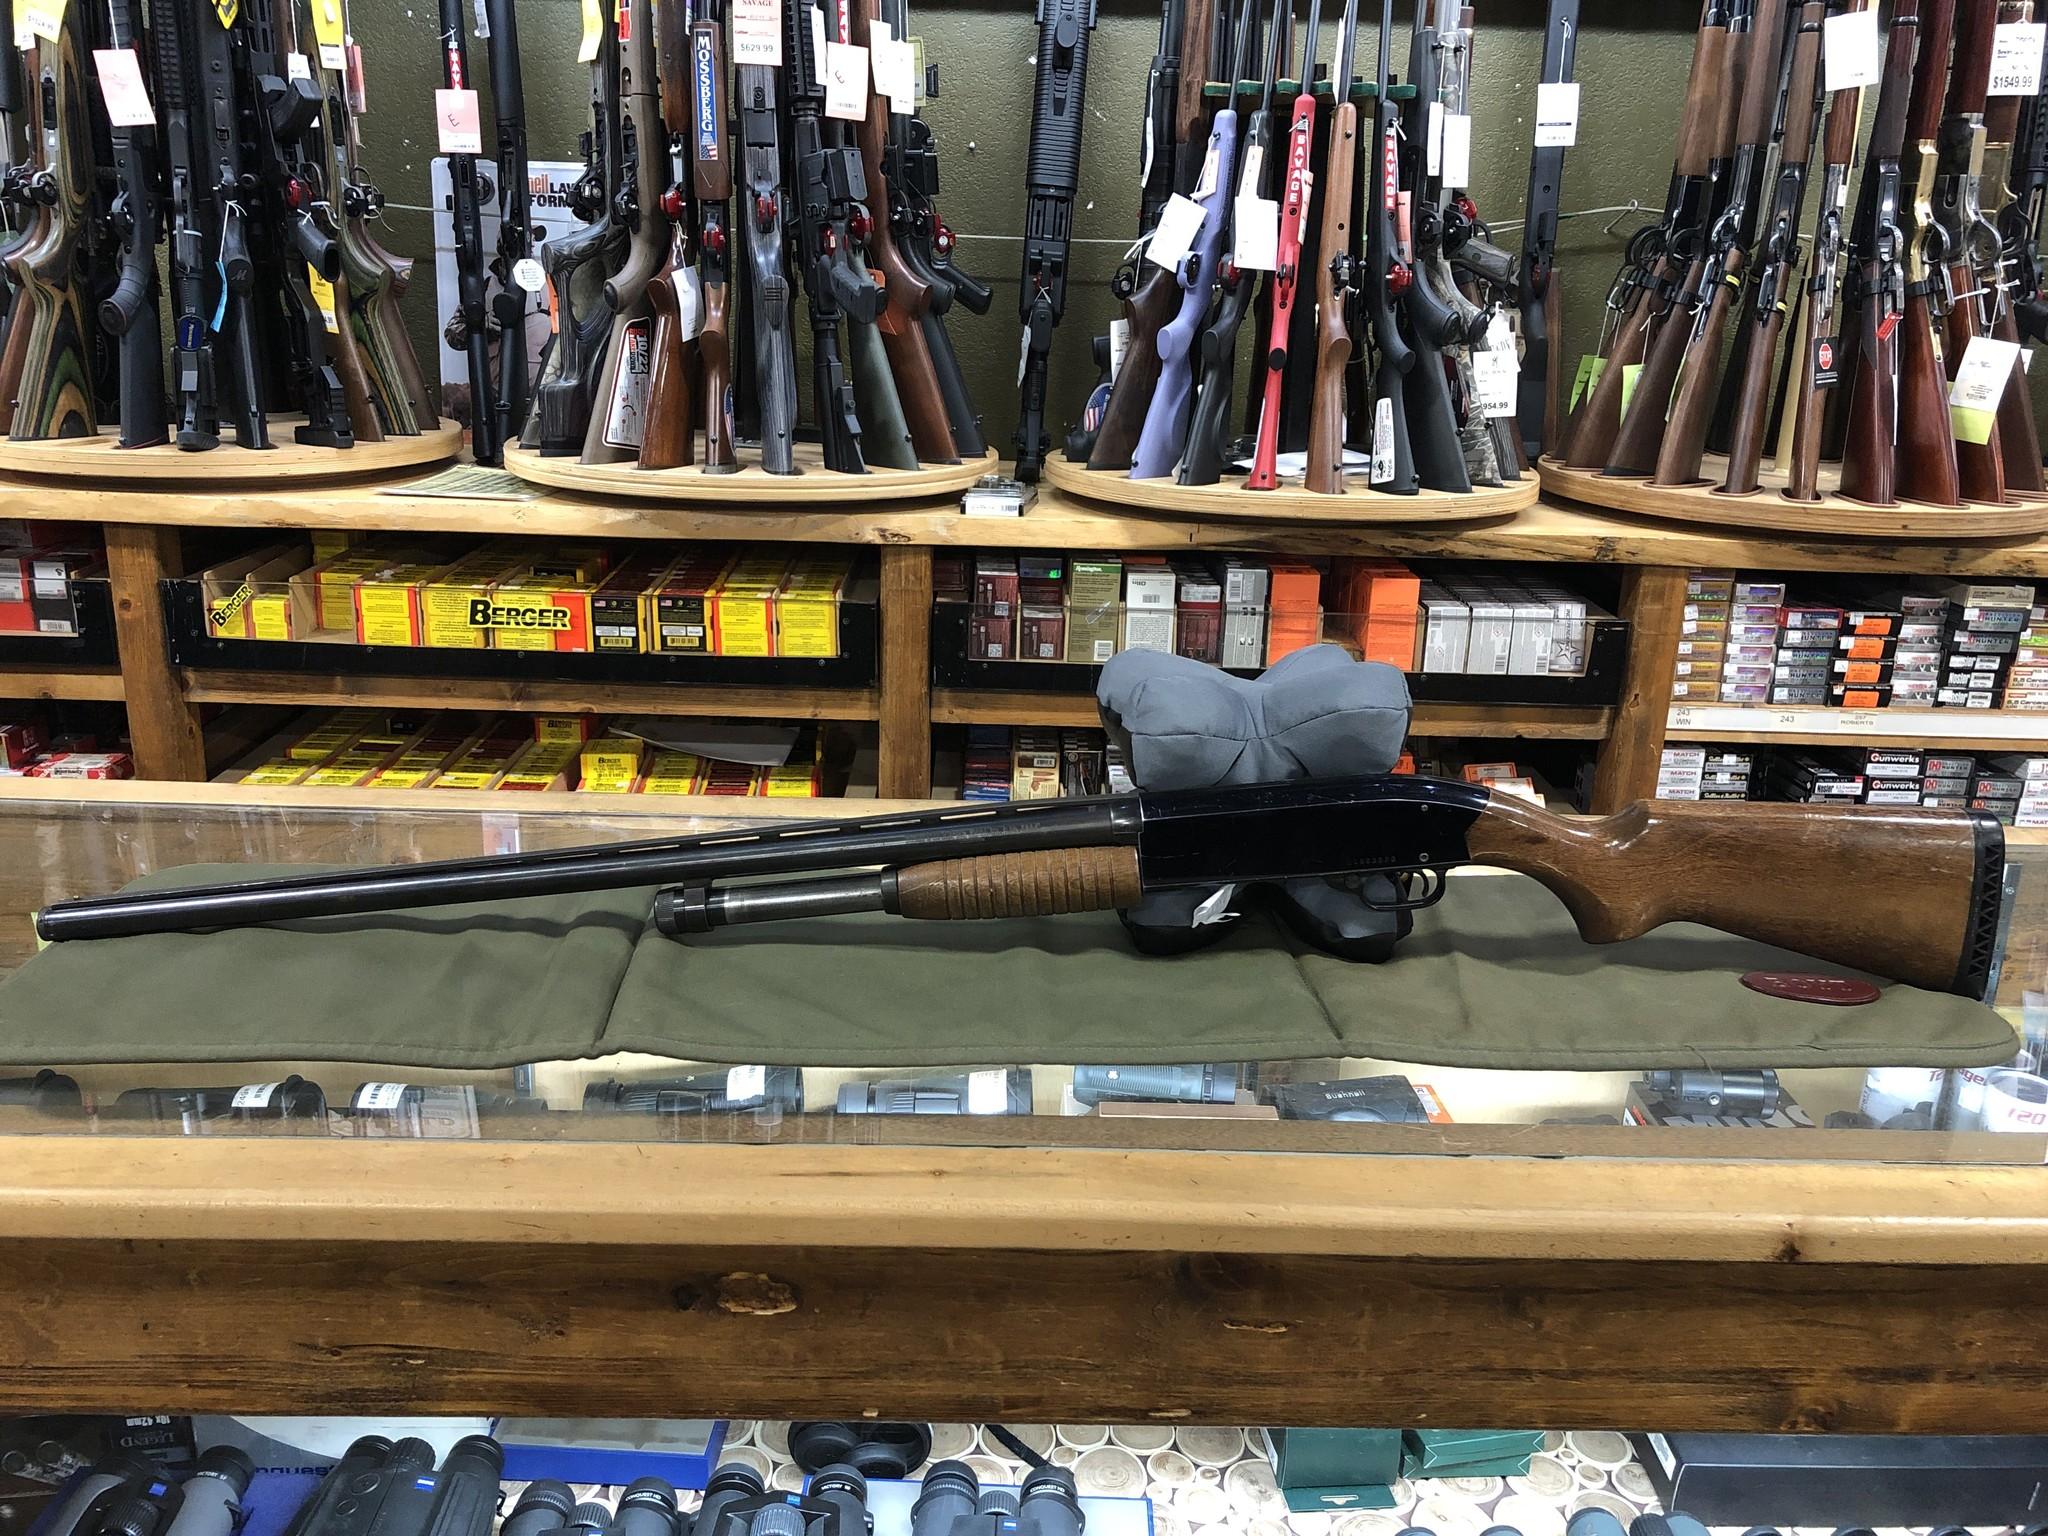 Winchester Winchester 120 12GA Pump G#3046